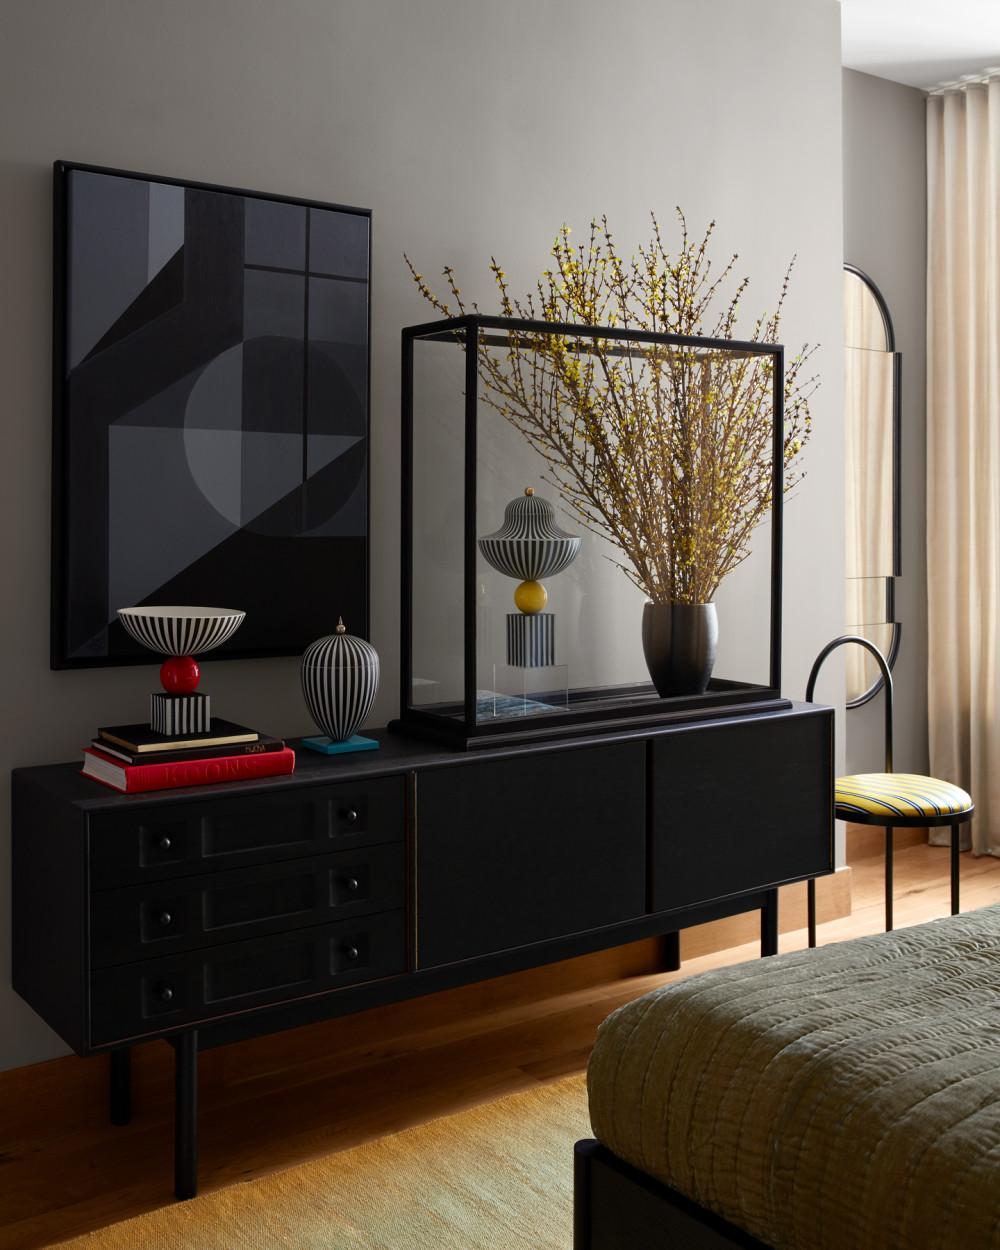 leebroom-living-room-skj-011.jpg